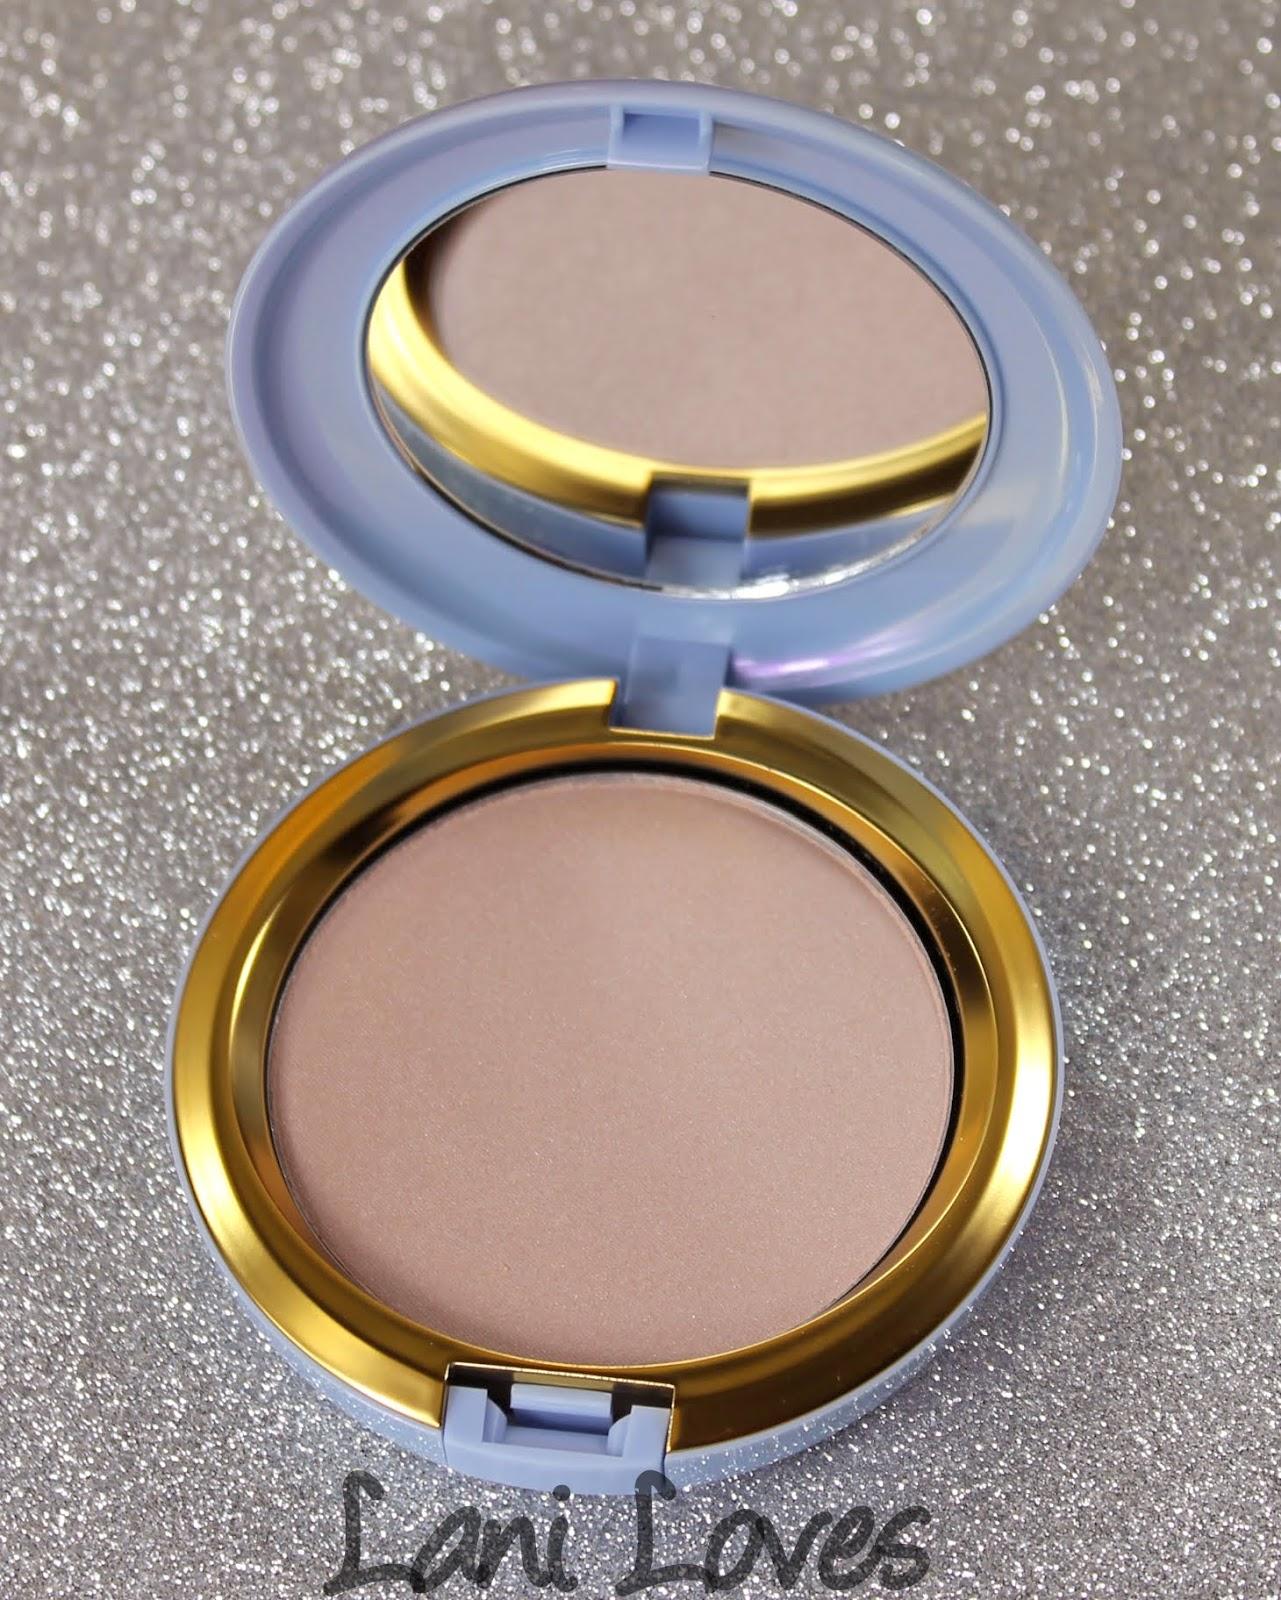 MAC Monday: Cinderella - Mystery Princess Beauty Powder Swatches & Review